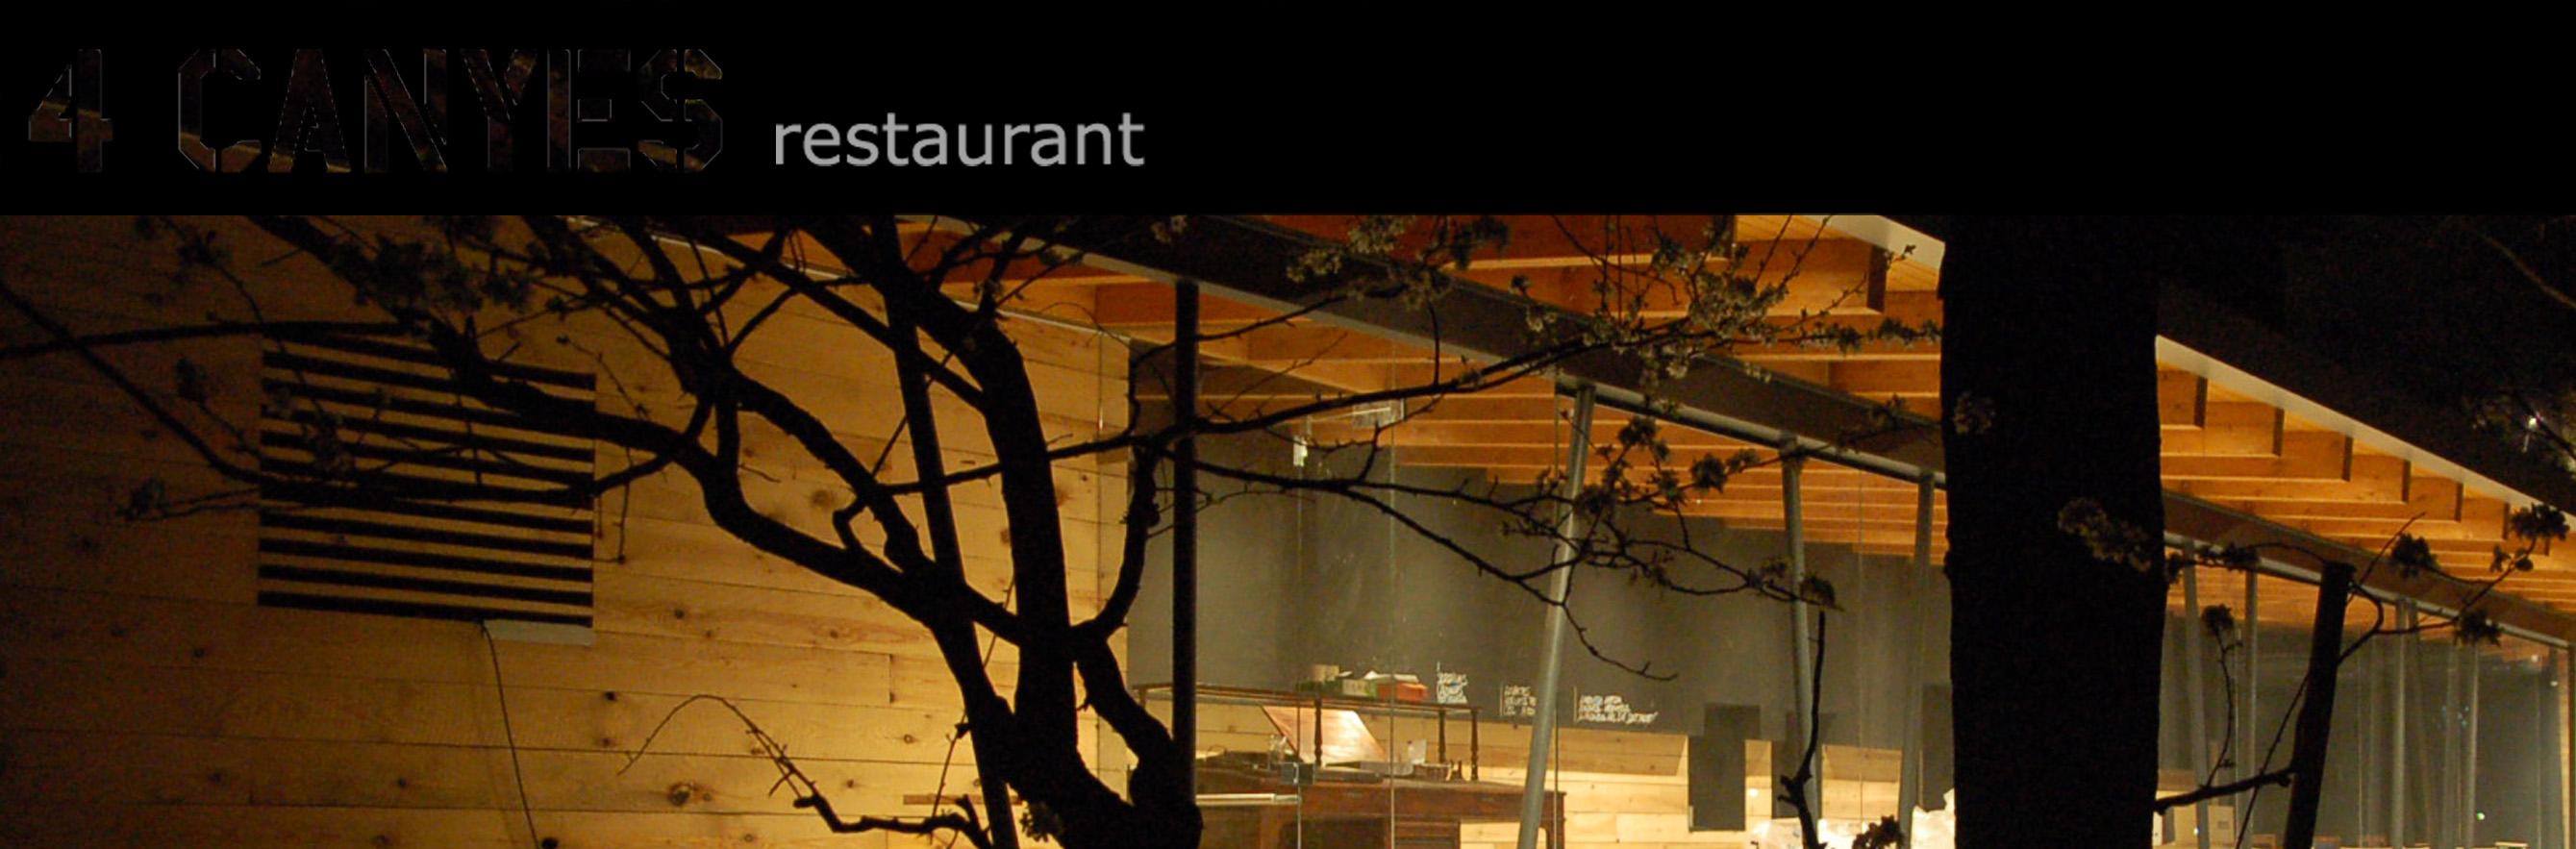 Restaurant braseria, cuina casolana